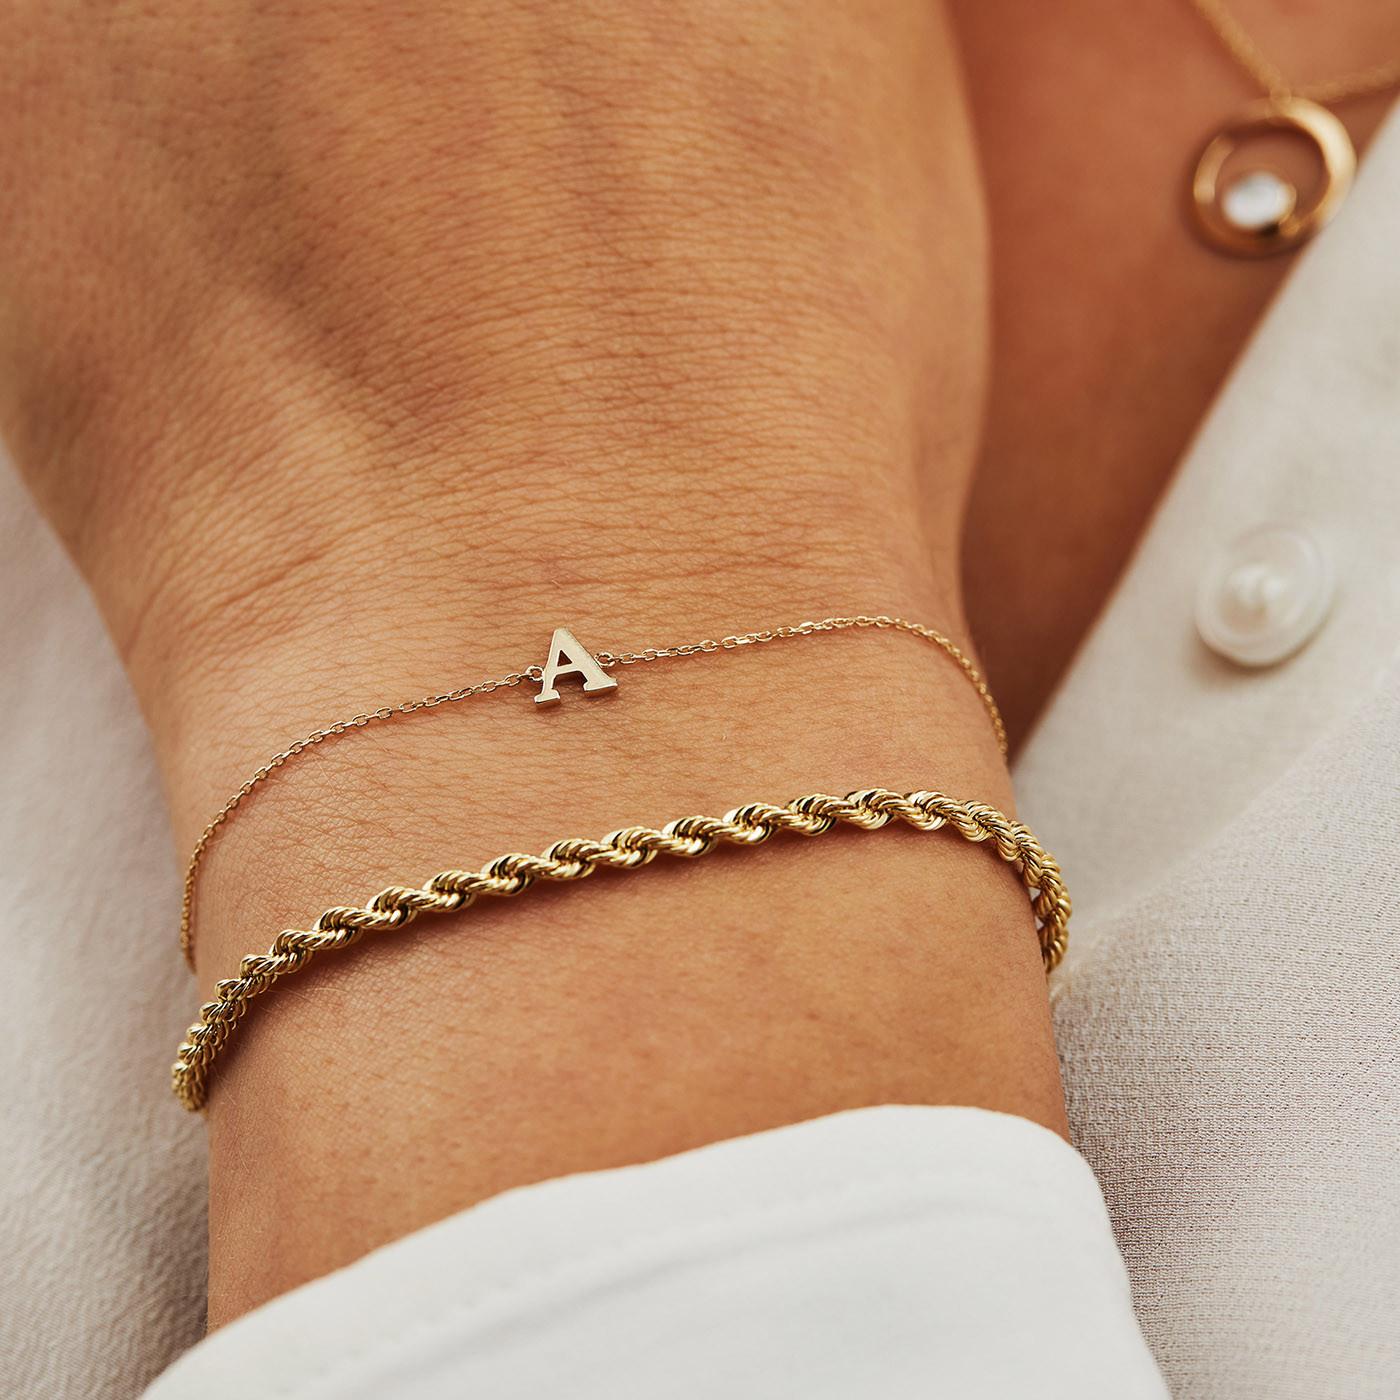 Isabel Bernard Le Marais Rachel 14 Karaat Gouden Initial Armband IB1001202 (Letter A t/m Z)